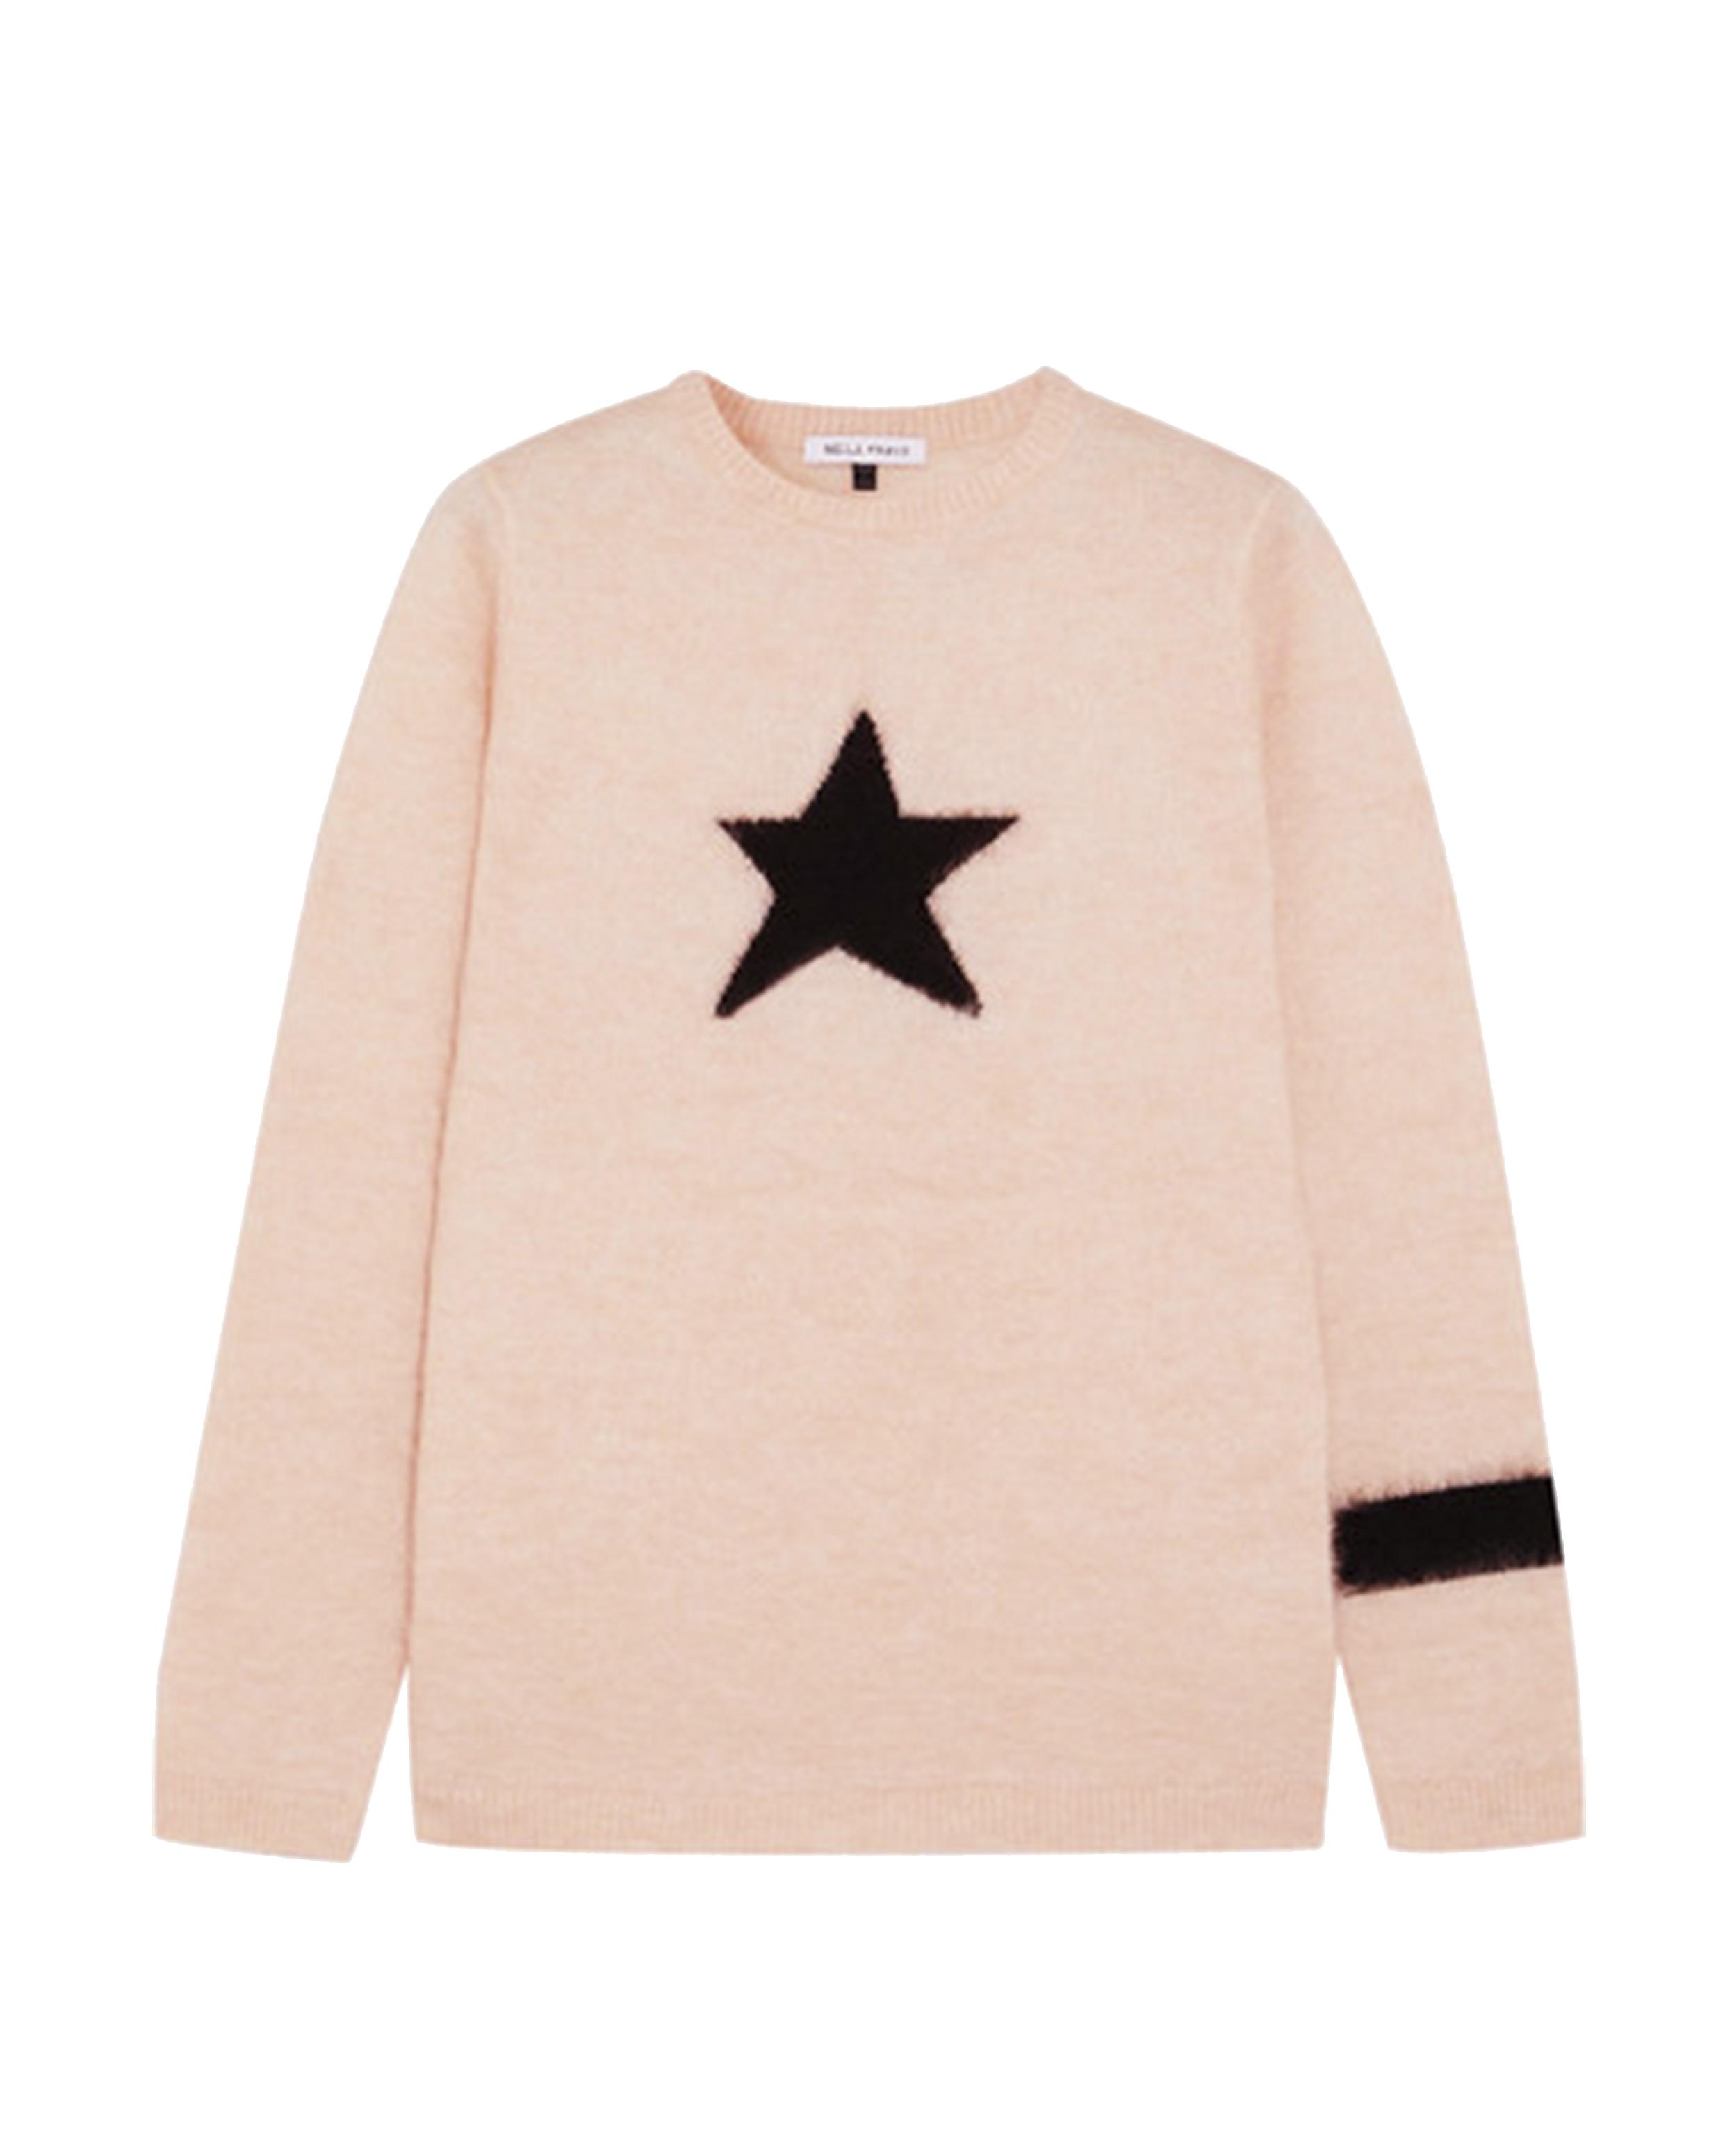 Bella Freud 7 - Mohair Star Jumper - Pink